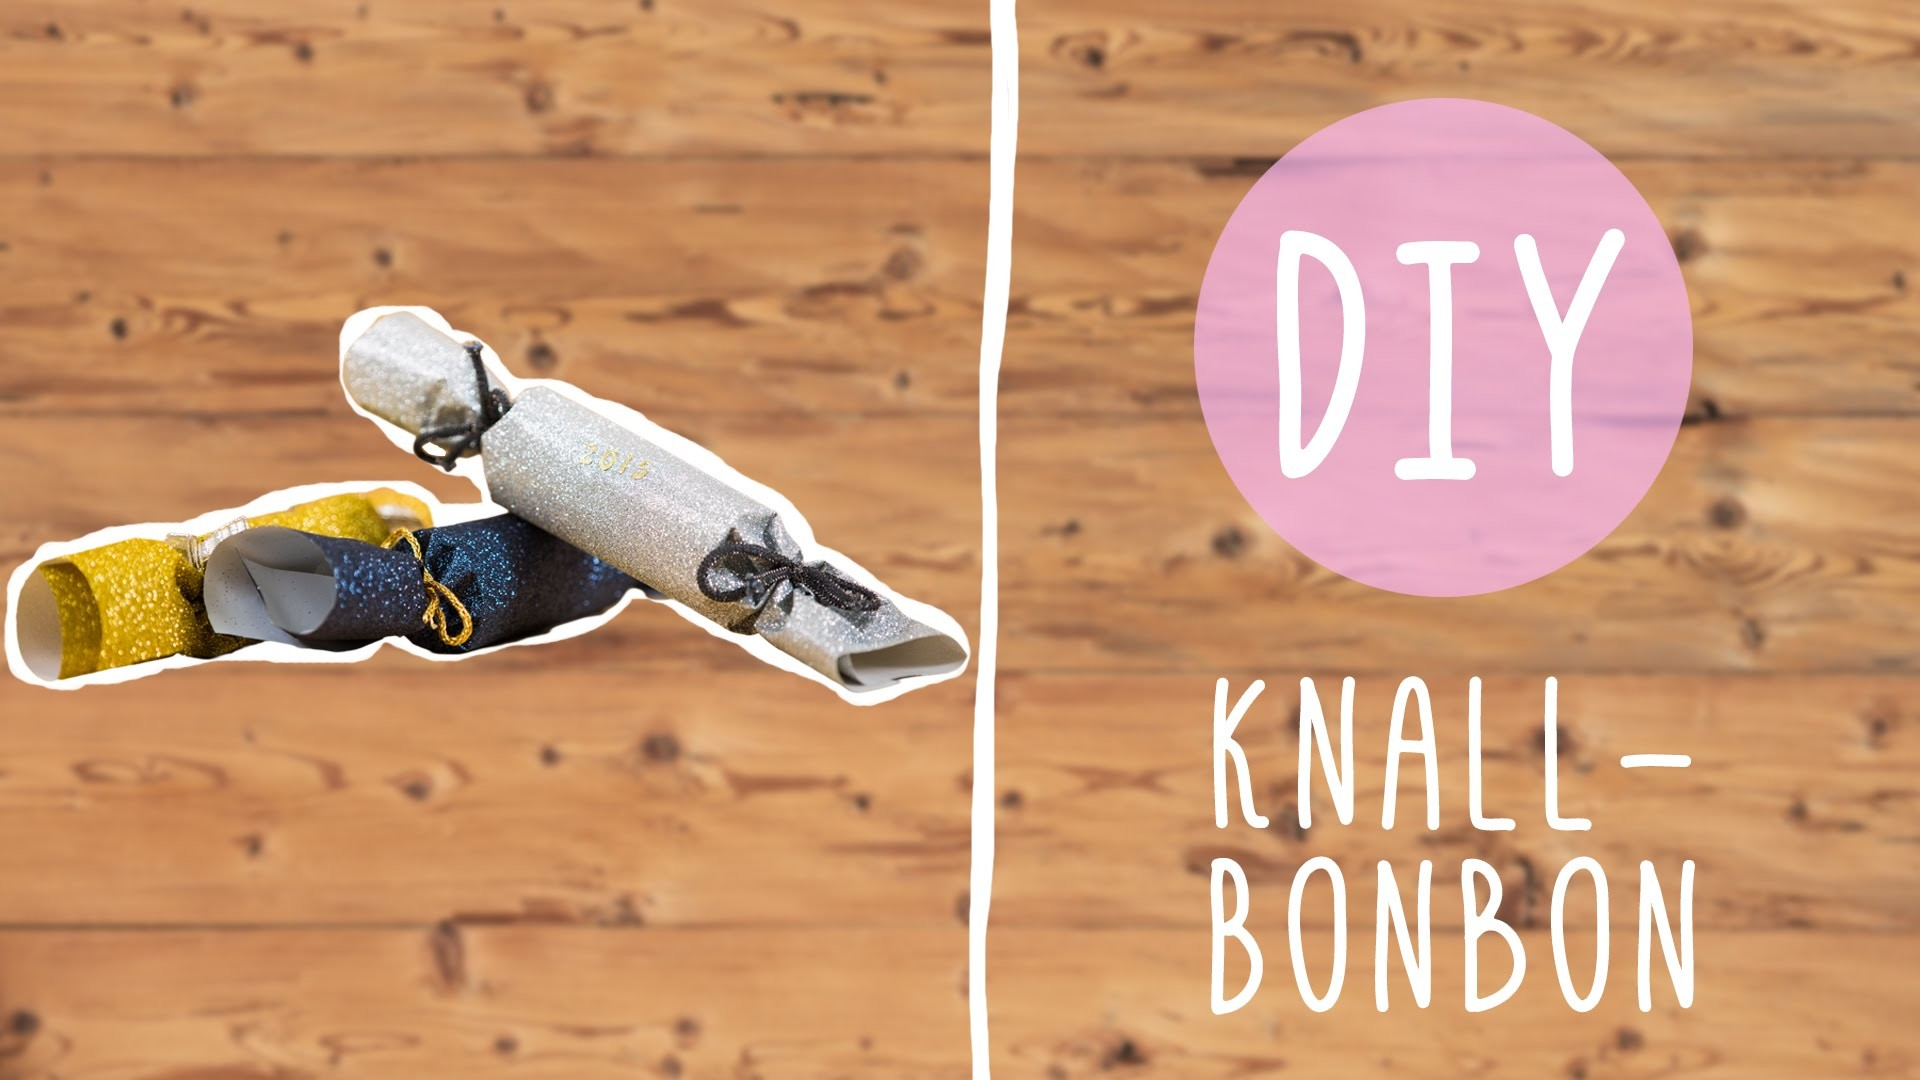 DIY mit Nina: Silvester Knallbonbons ganz einfach selbst gemacht!